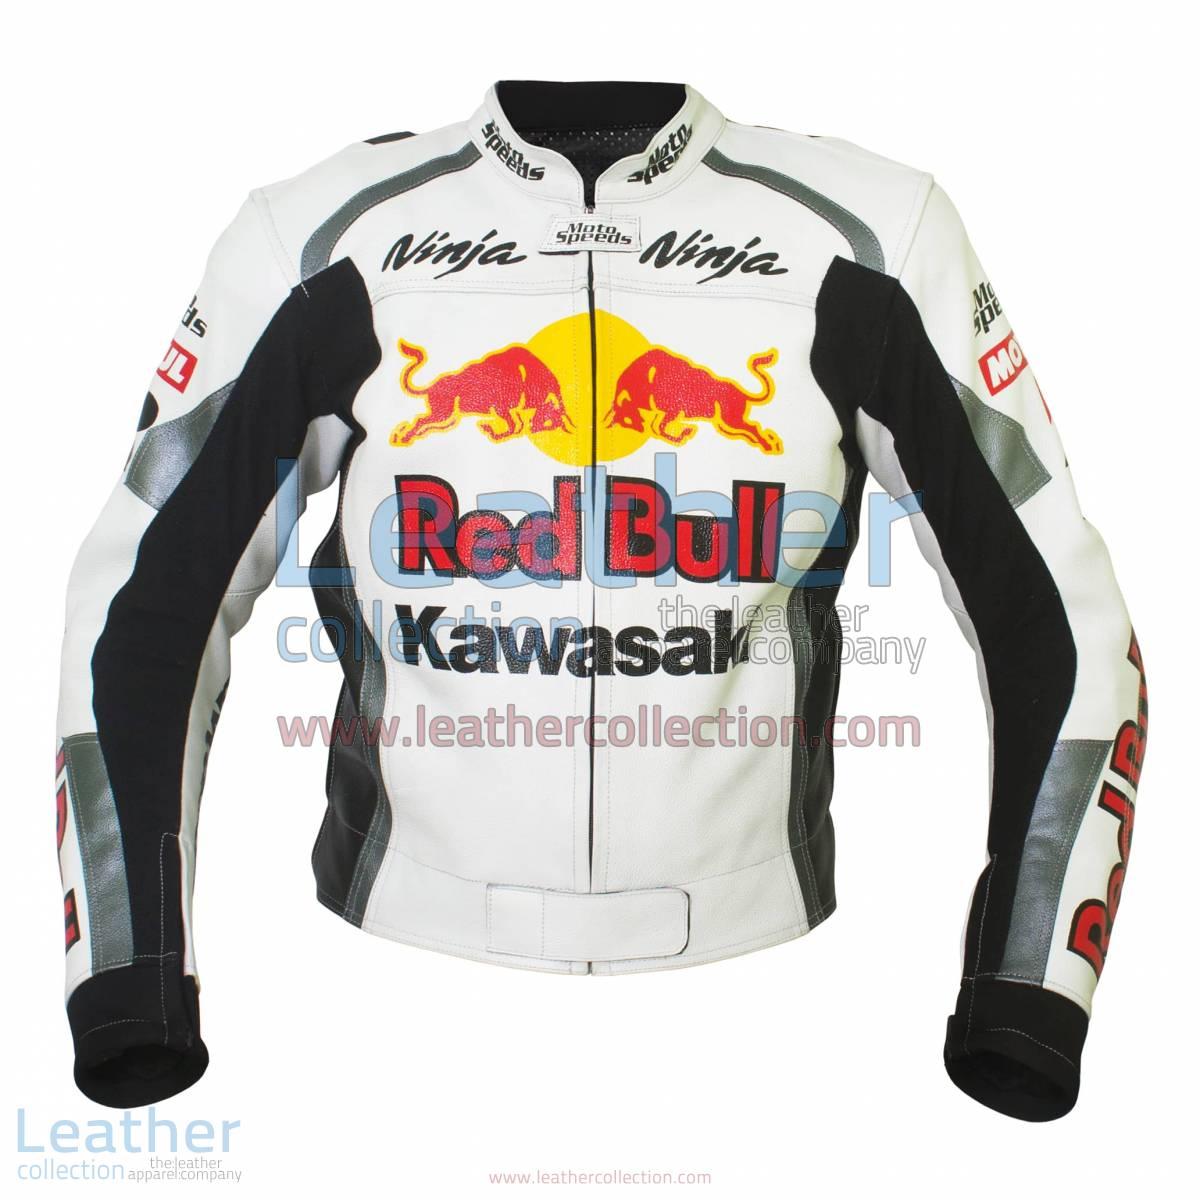 Kawasaki Ninja Red Bull Motorbike Leather Jacket | Red Bull jacket